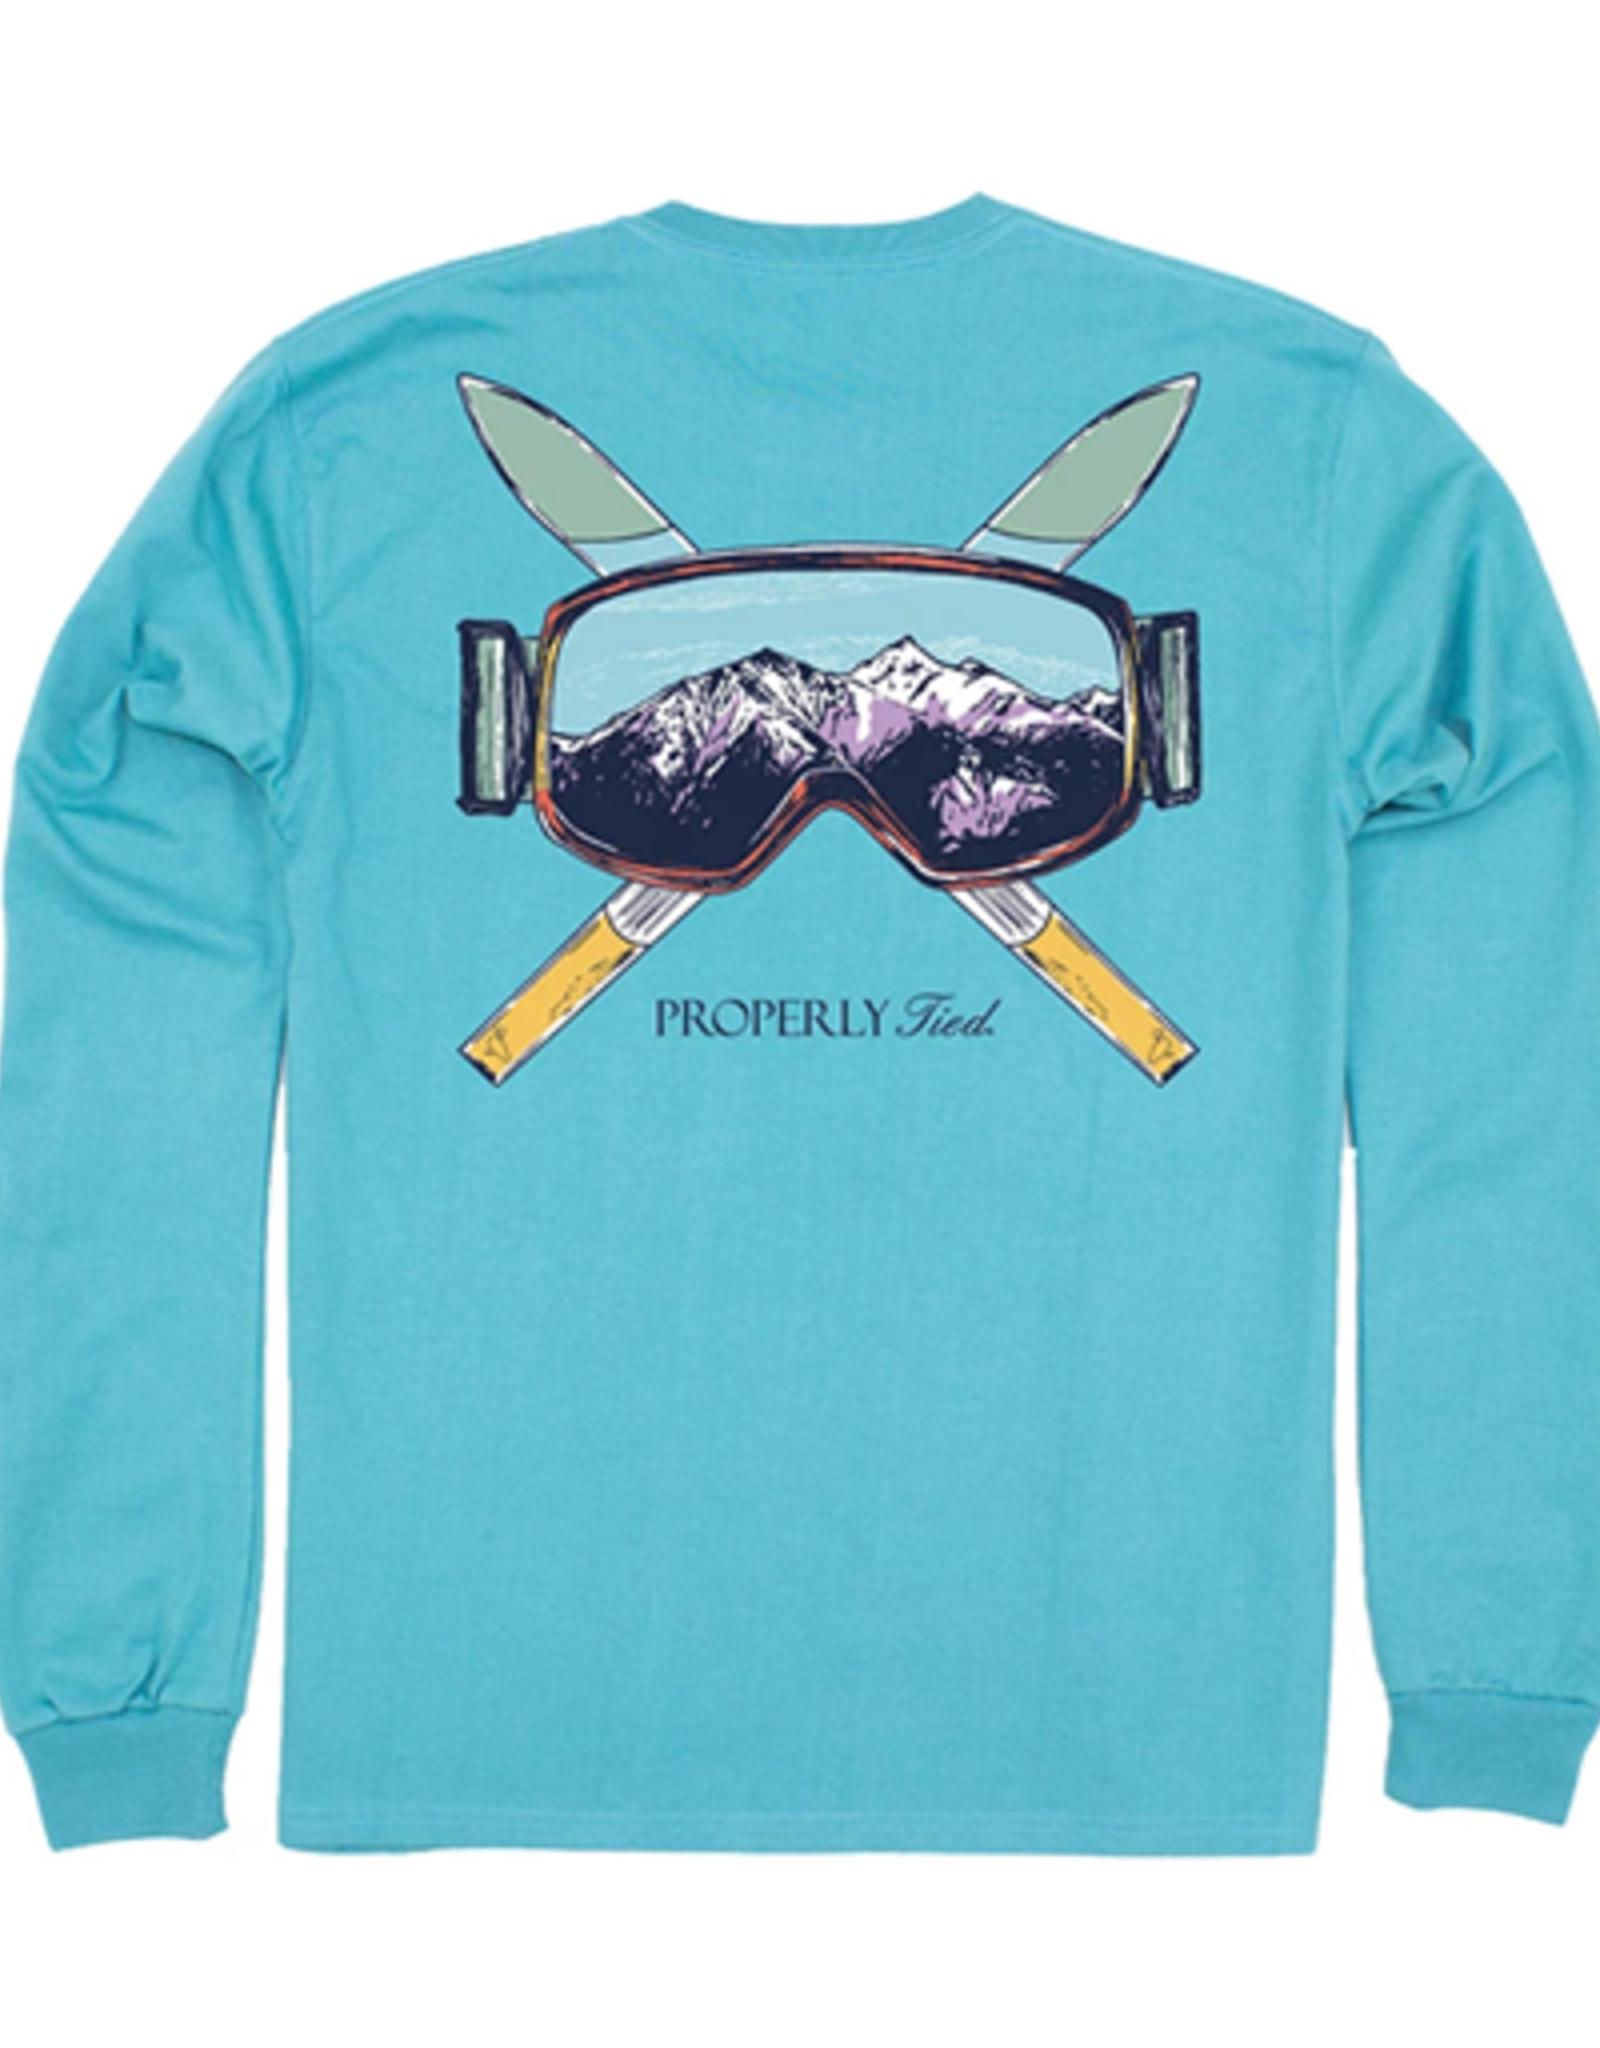 Properly Tied Ski Mountain LS Emerald